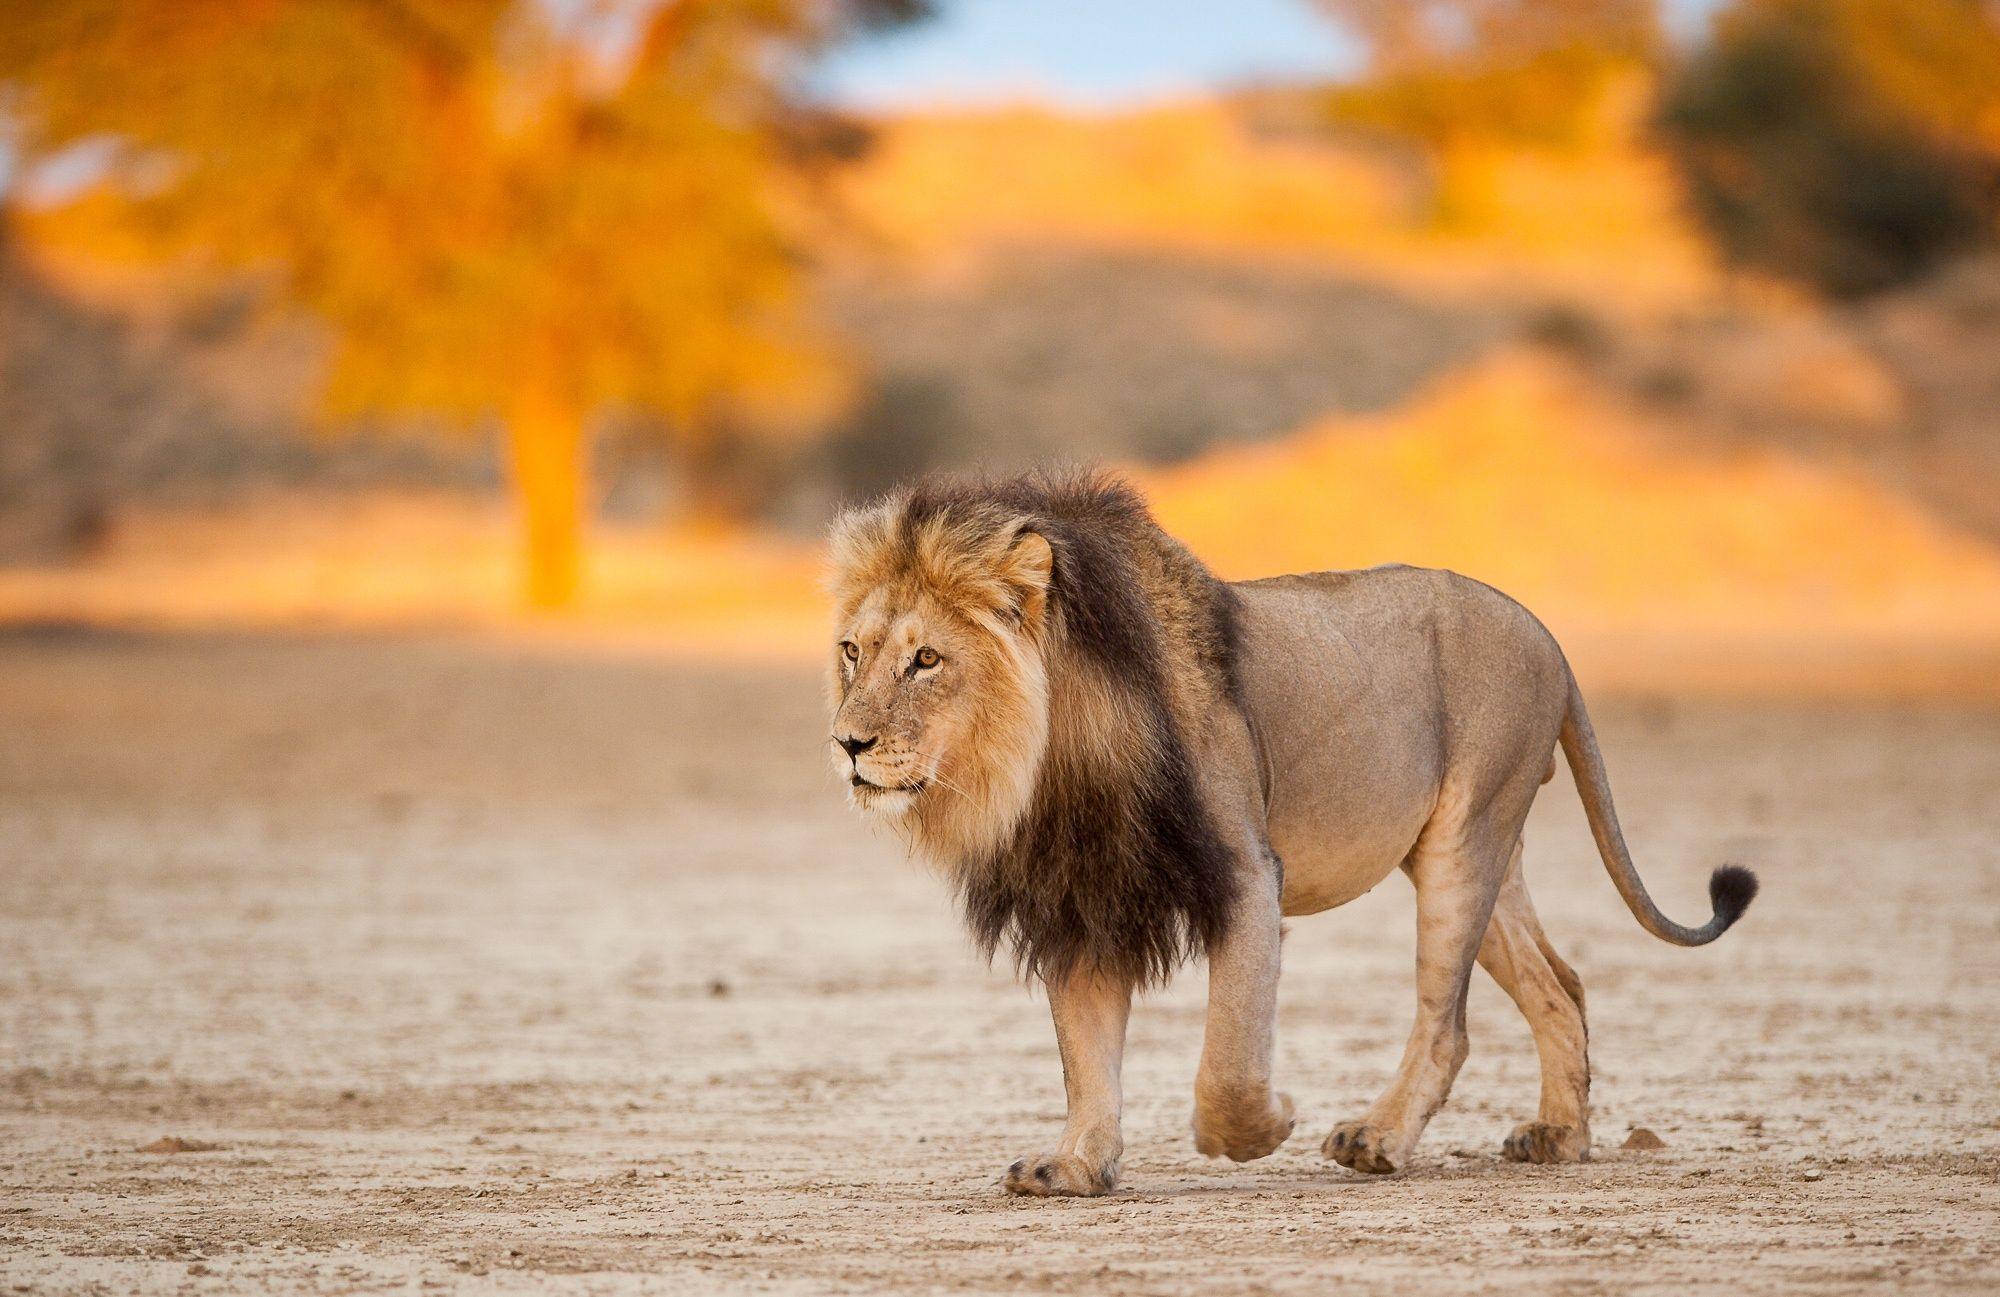 Photograph Kgalagadi Lion at sunset by johan barnard on 500px